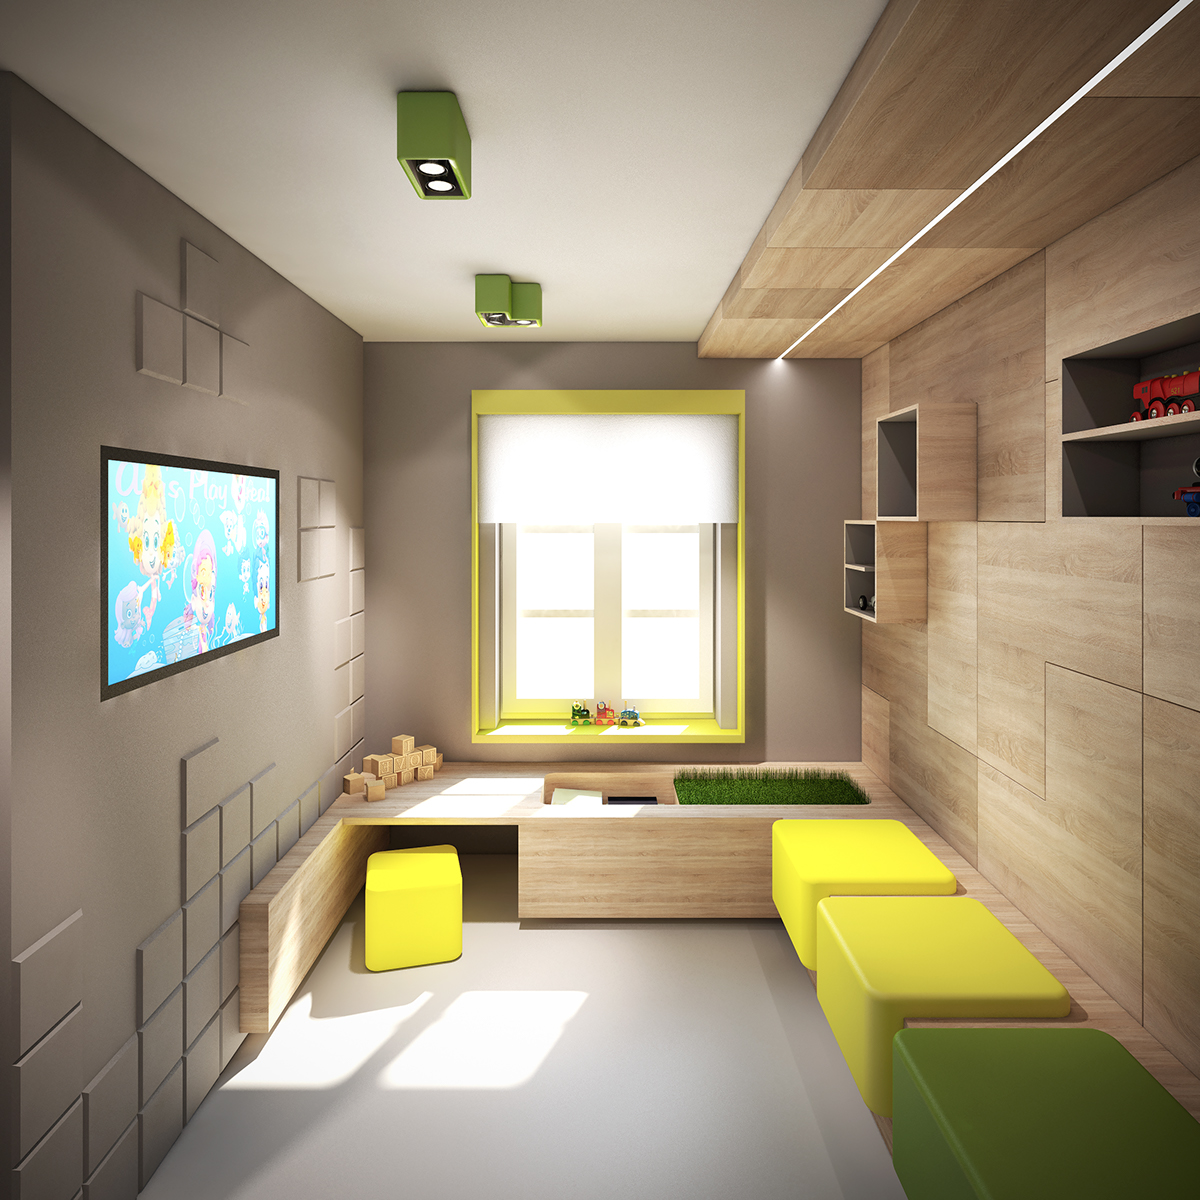 Interior Design For Pediatric Practice On Behance